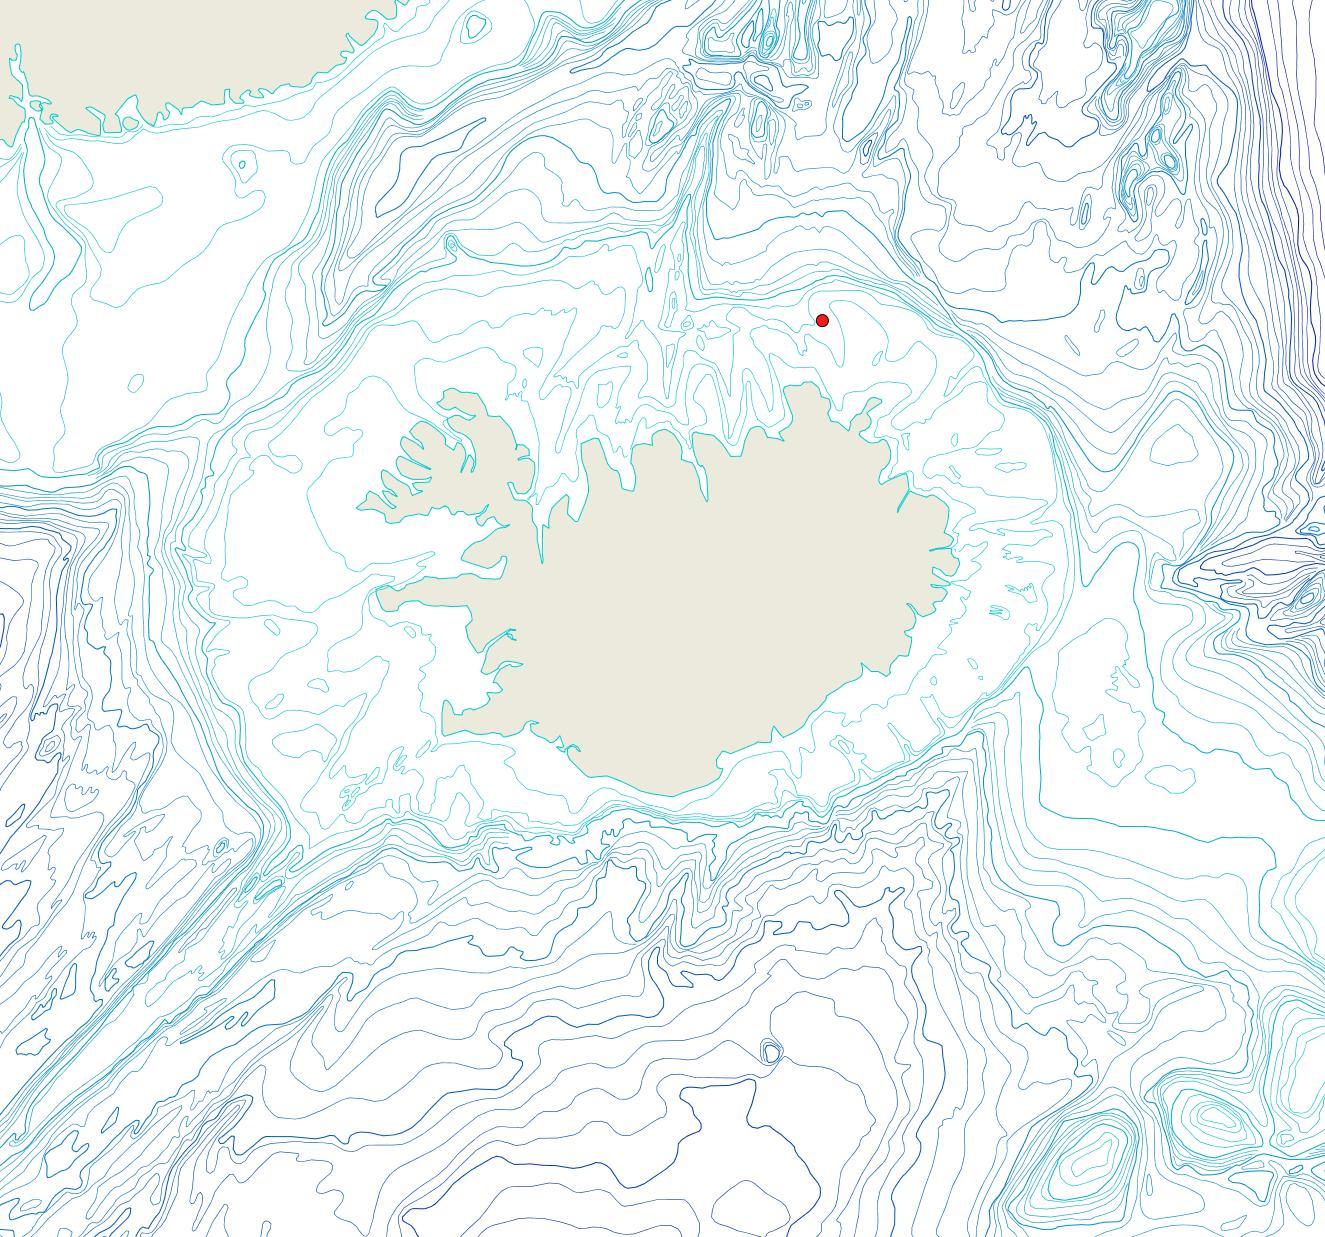 Útbreiðsla Porella aperta(Bioice samples, red dots)